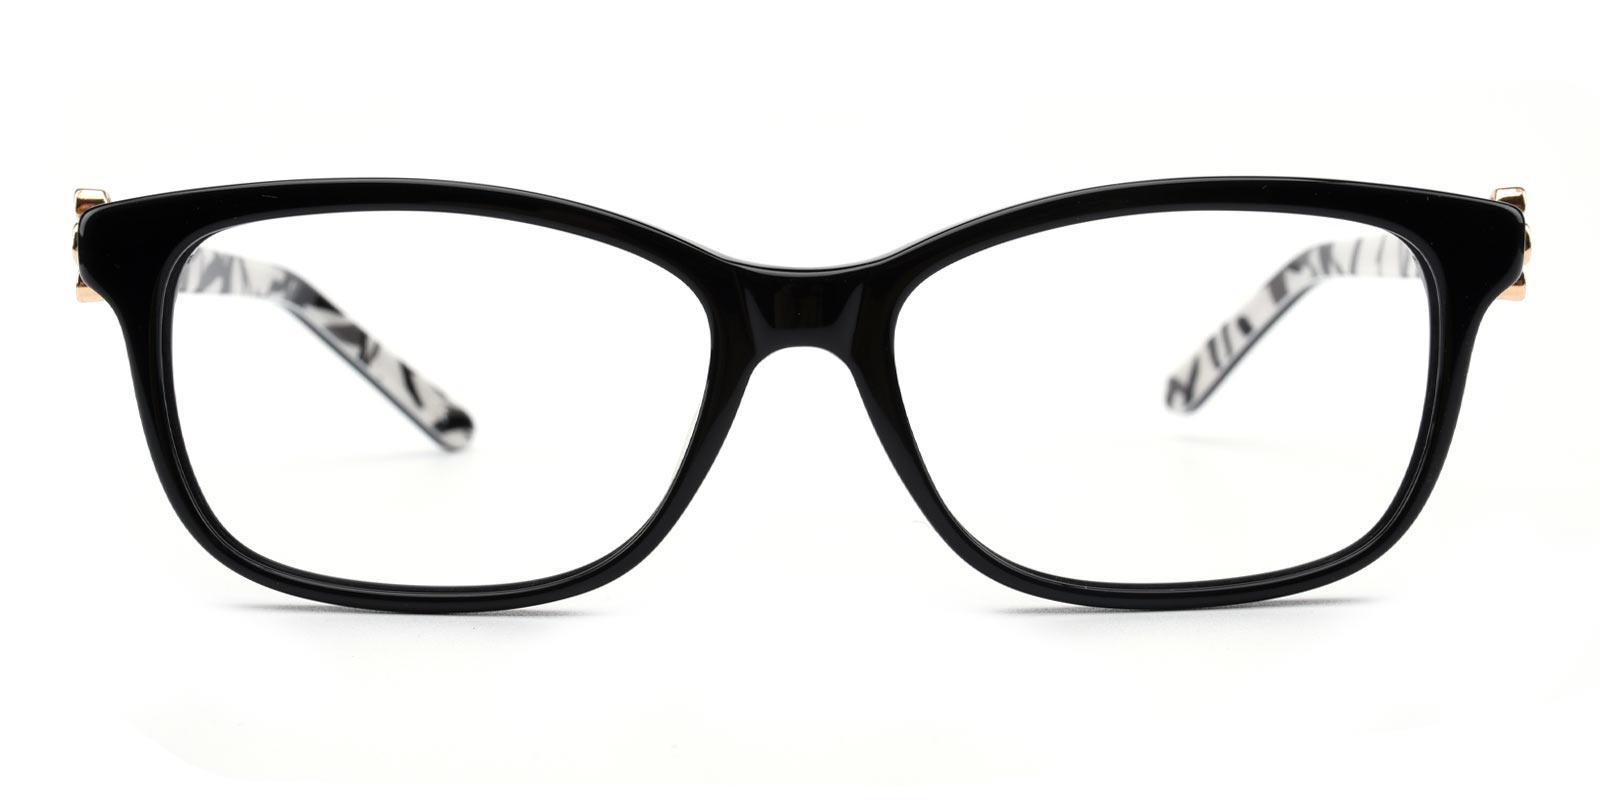 Afterwards-Striped-Rectangle-TR-Eyeglasses-detail